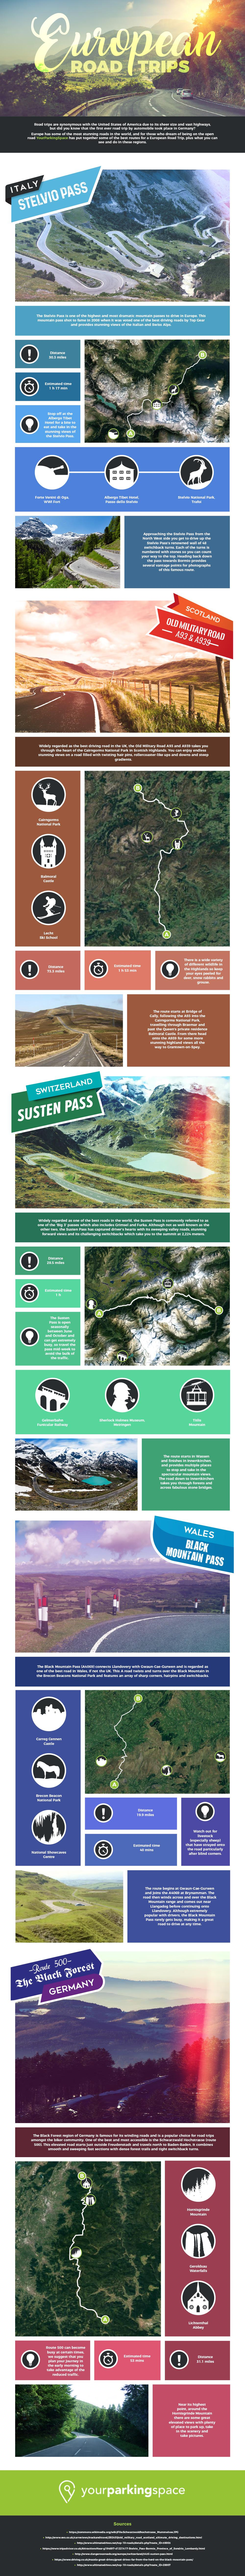 european road trip infographic